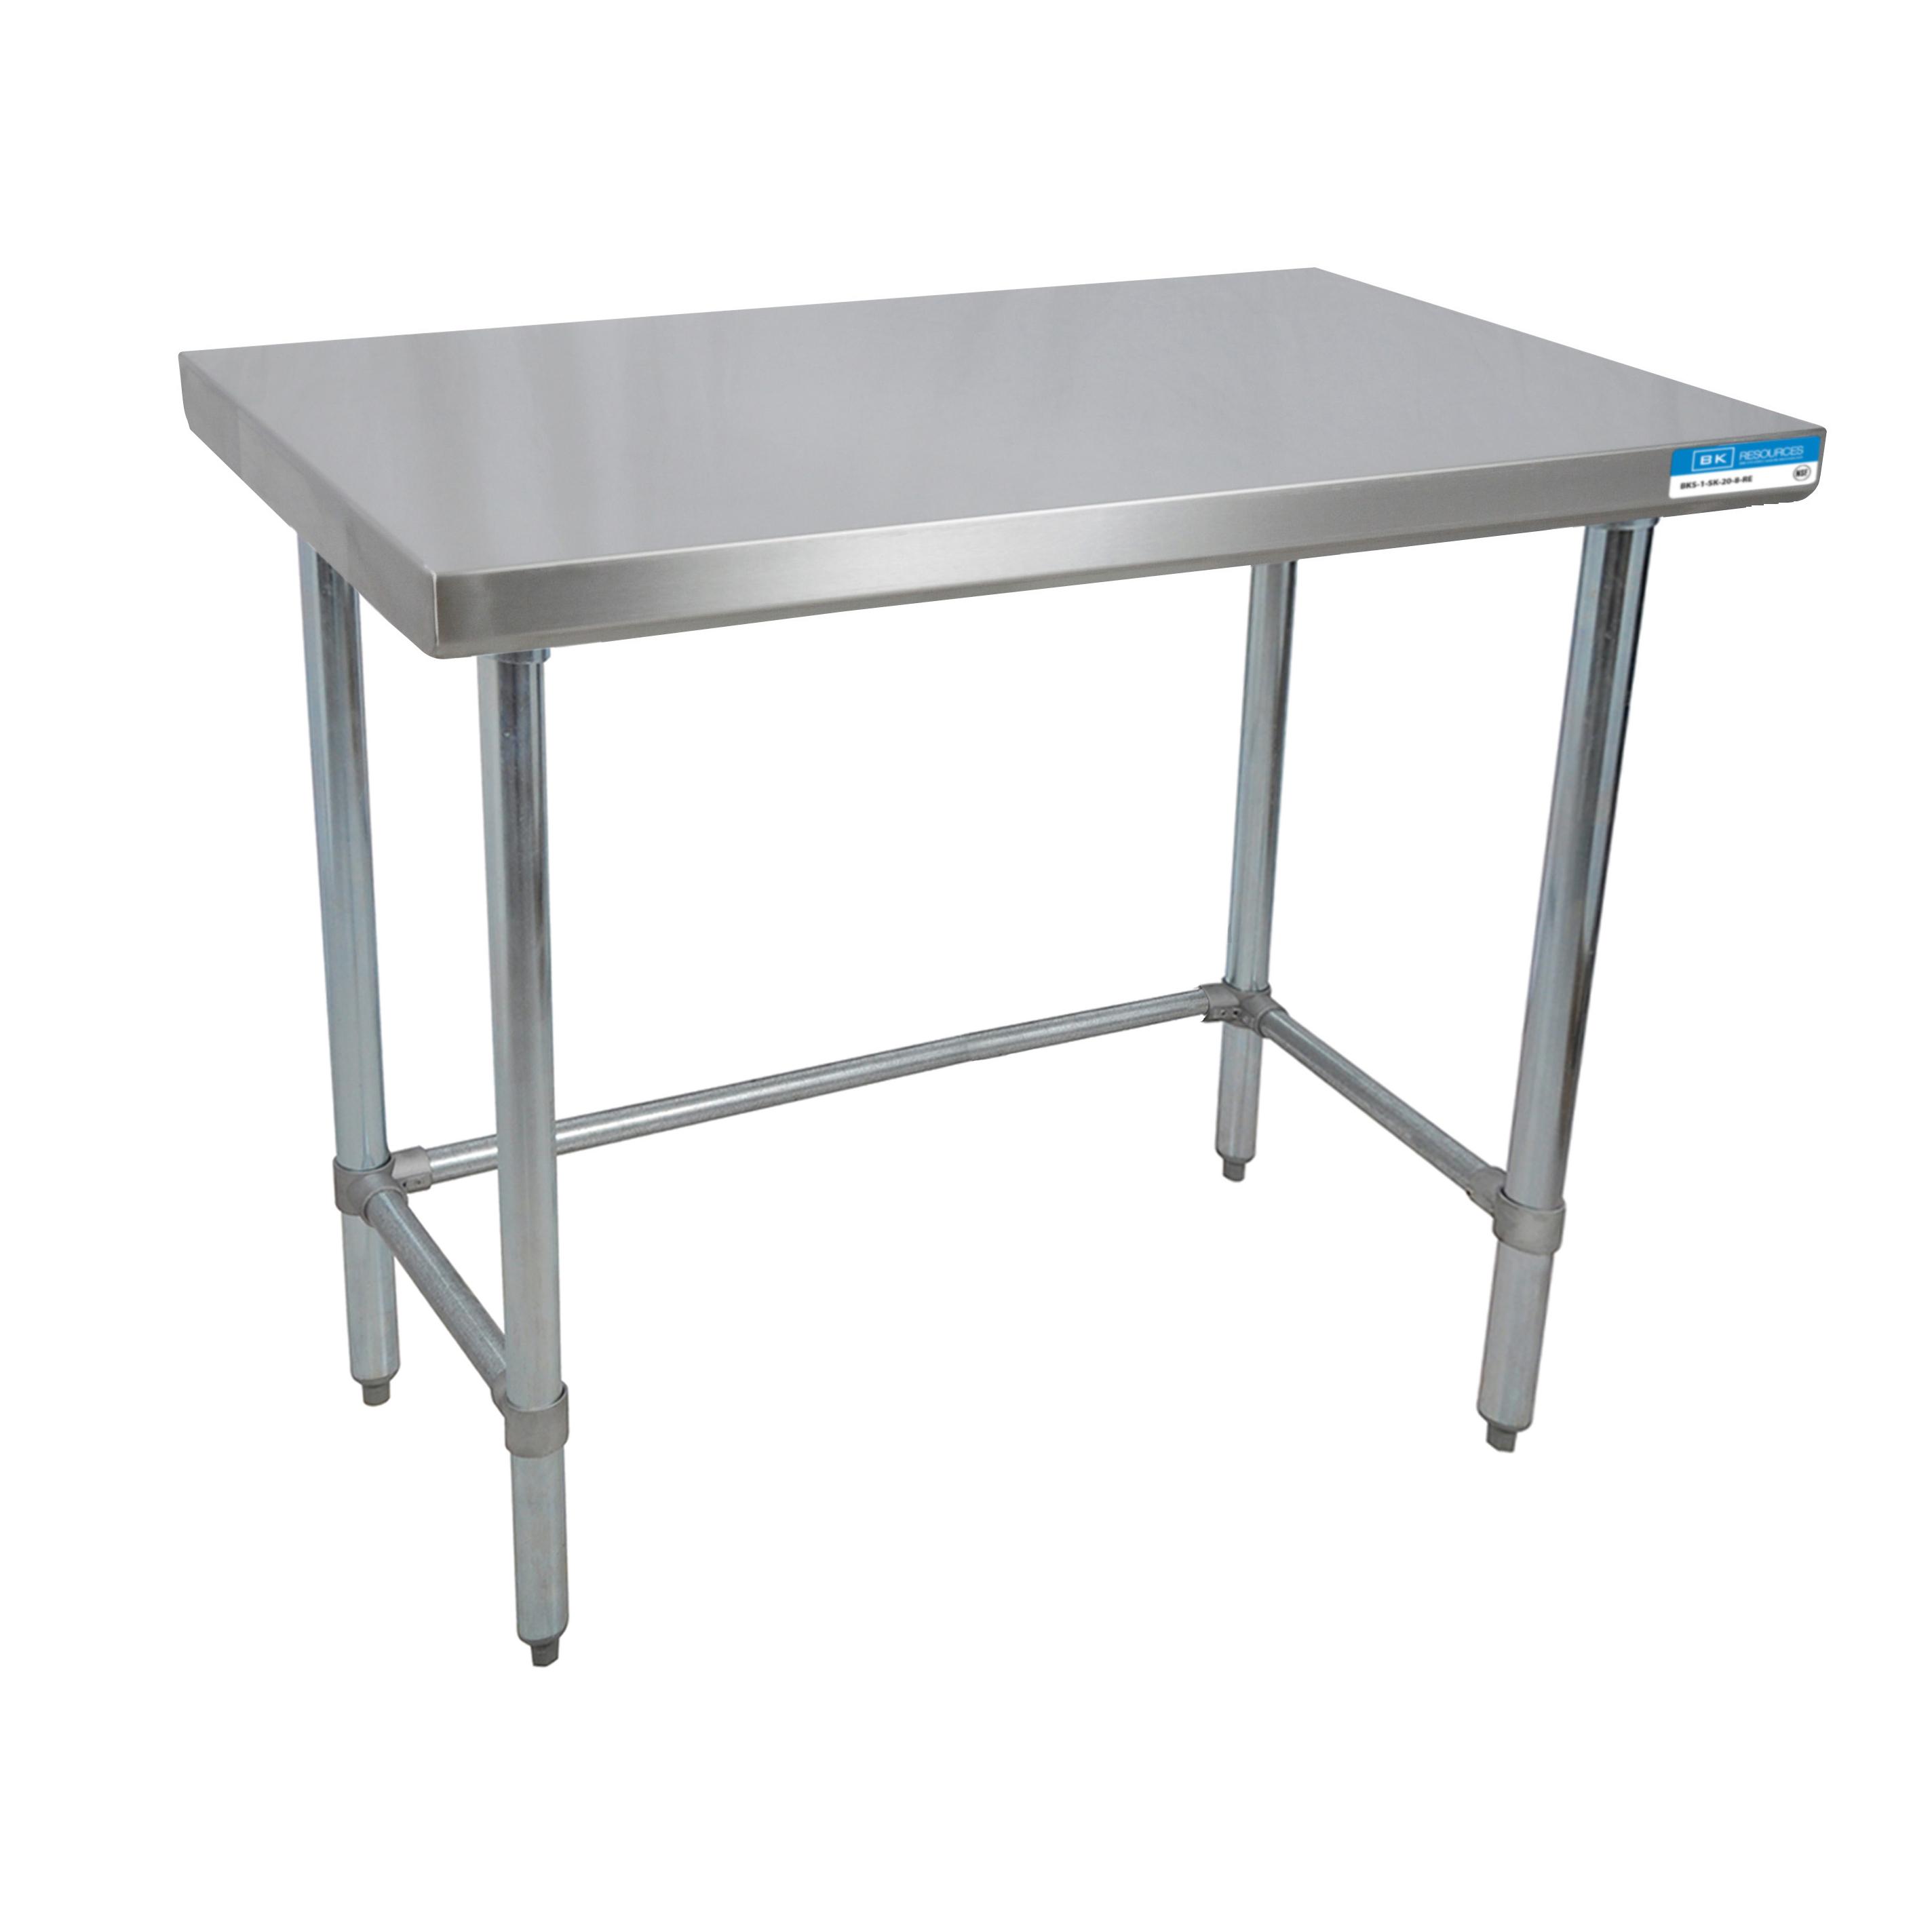 BK Resources QVTOB-4836 work table,  40